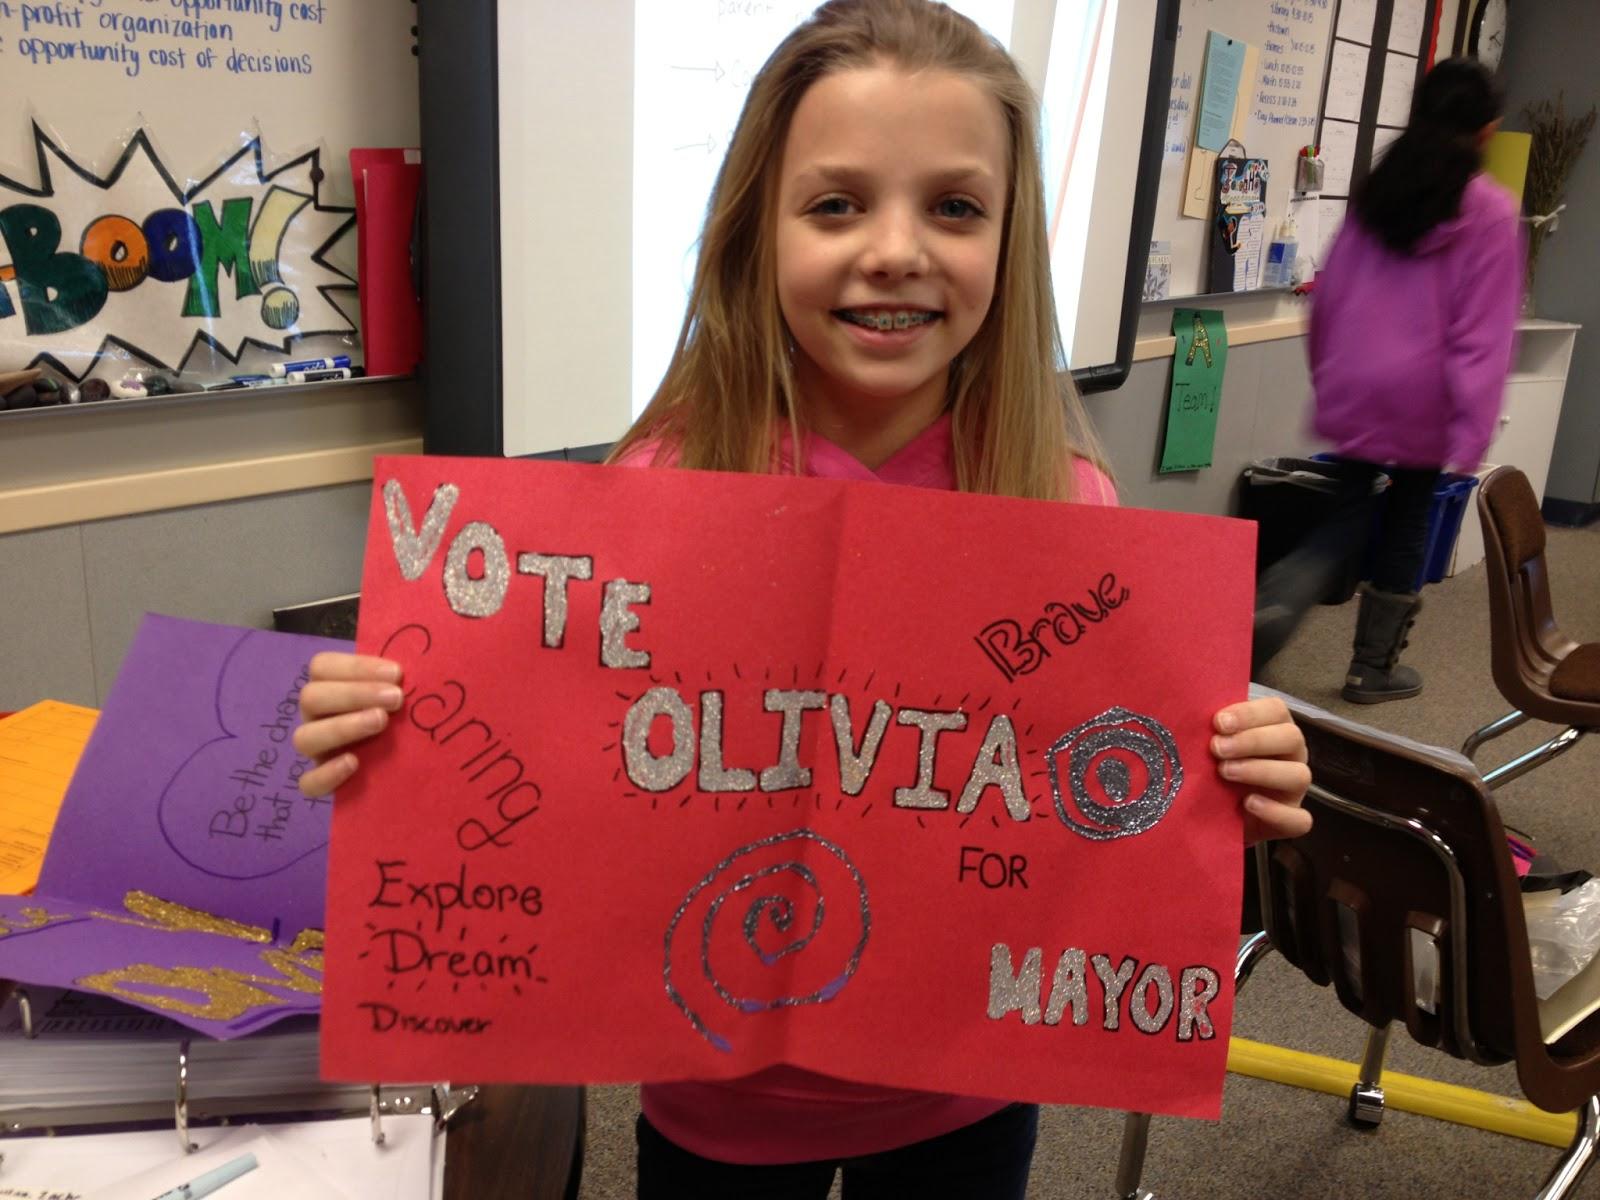 Running For Mayor Slogans